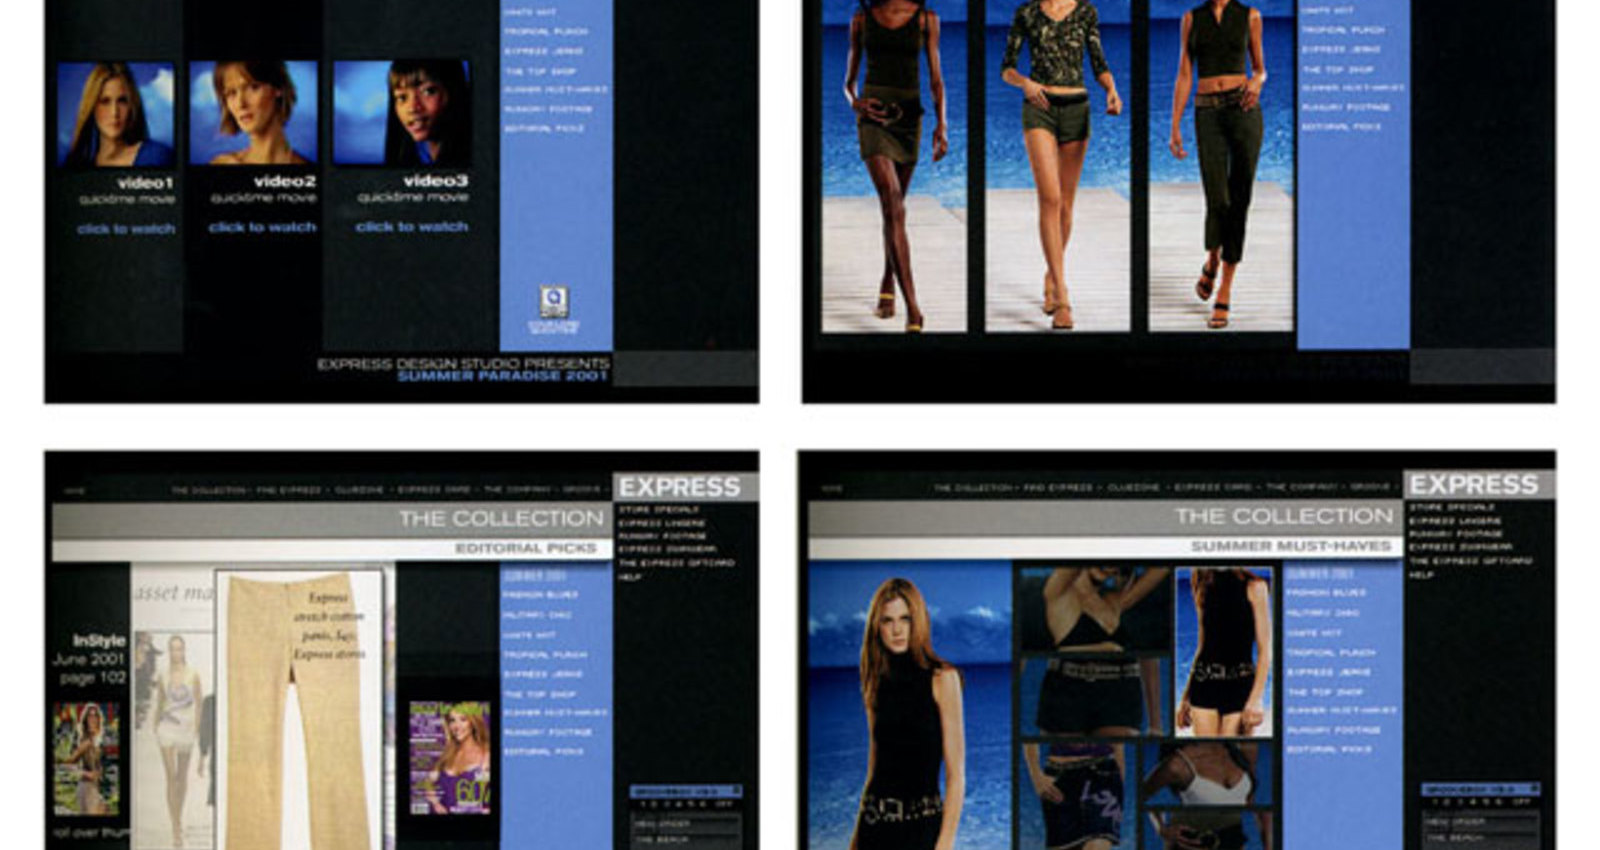 Express web site